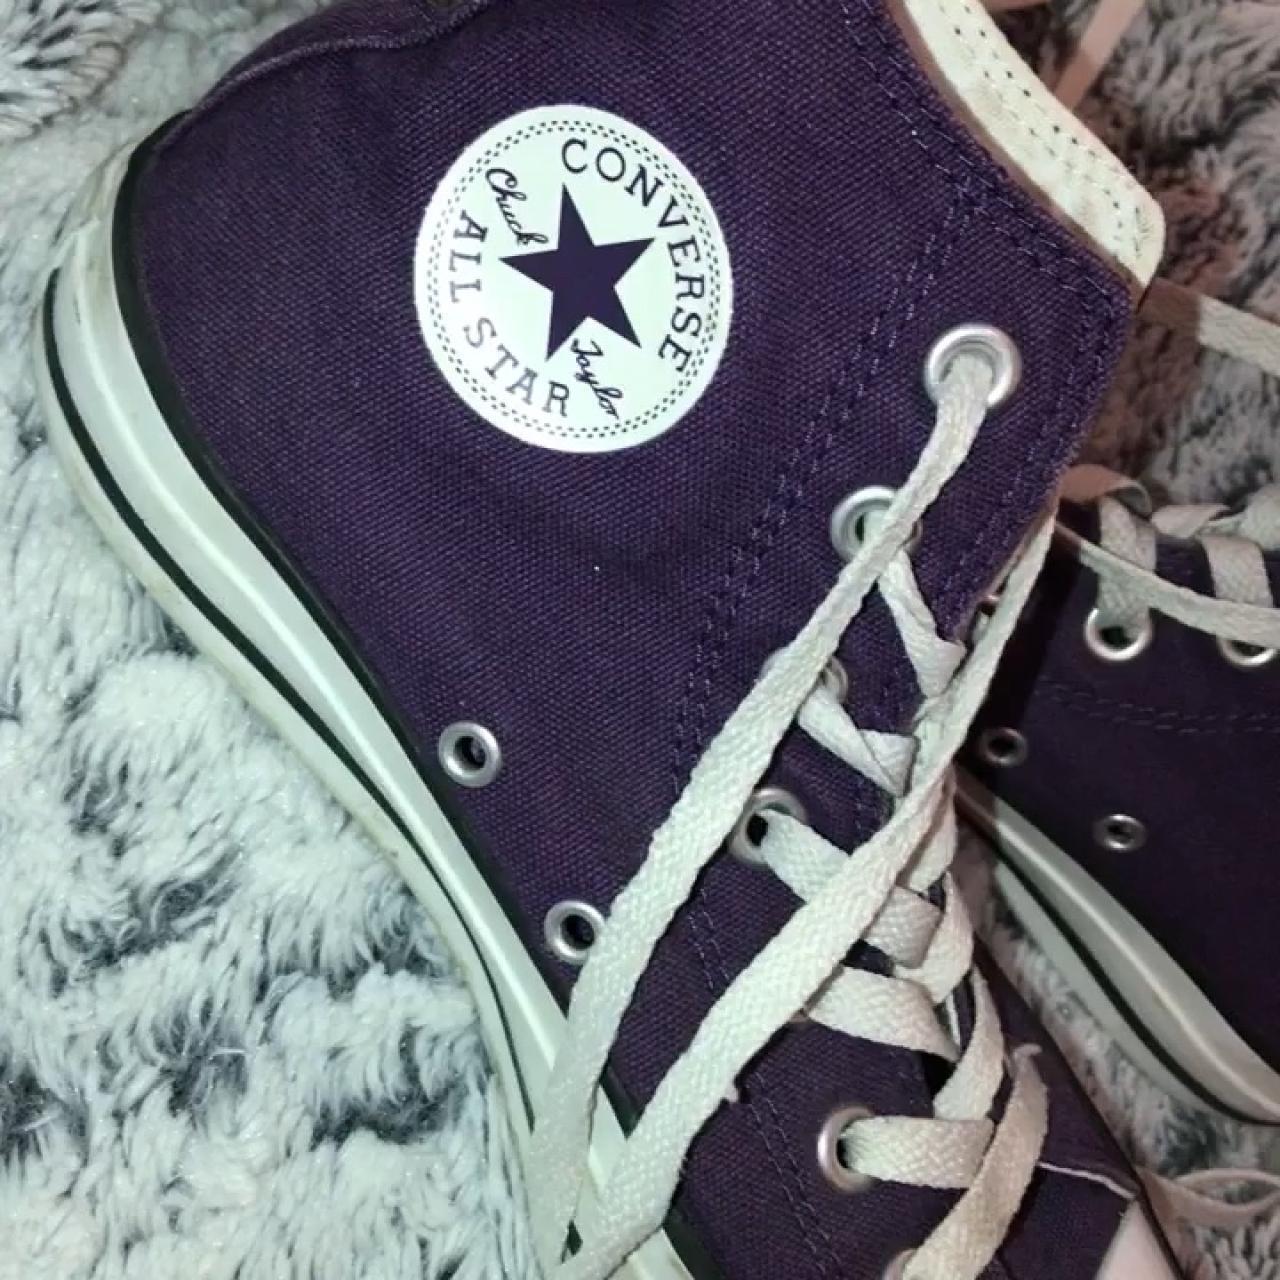 6cabd2261f06 Dark purple High top converse all stars